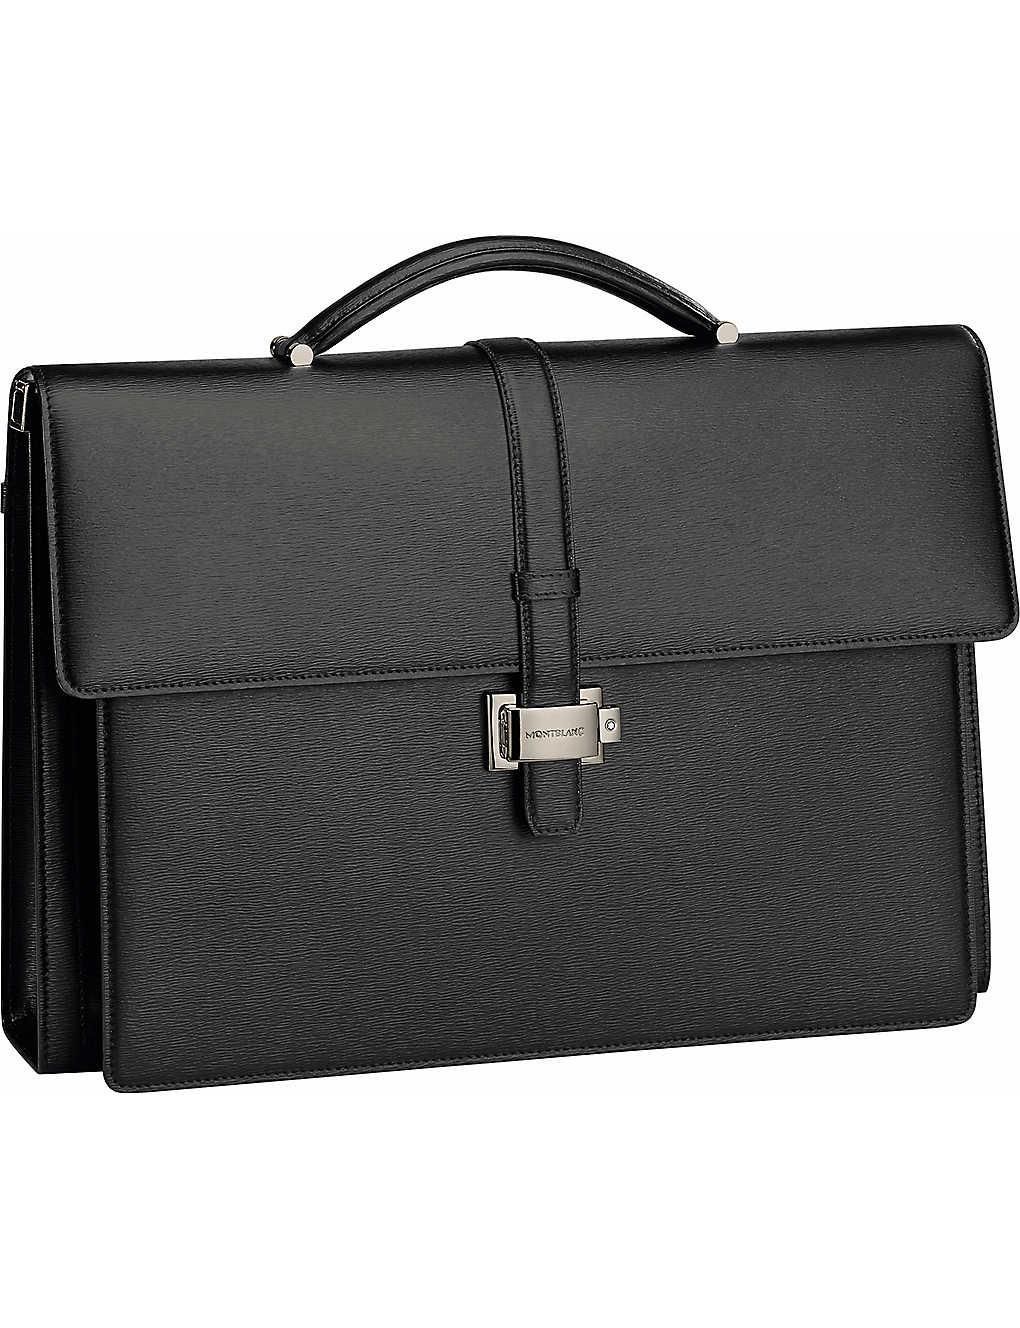 8626c2b690 MONTBLANC - Westside Double Gusset leather briefcase | Selfridges.comm